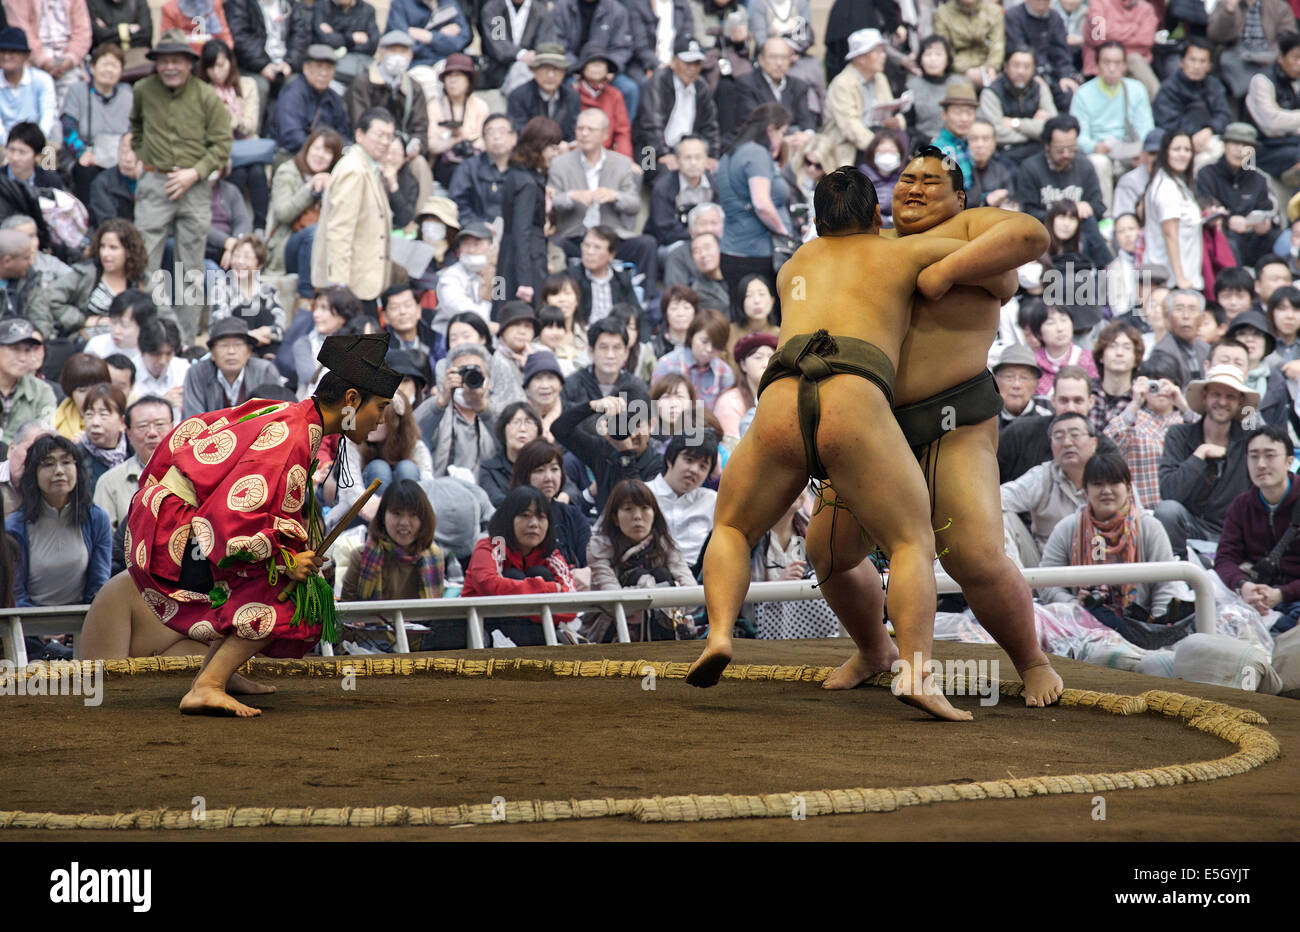 Sumo wrestling match, Tokyo, Japan. - Stock Image